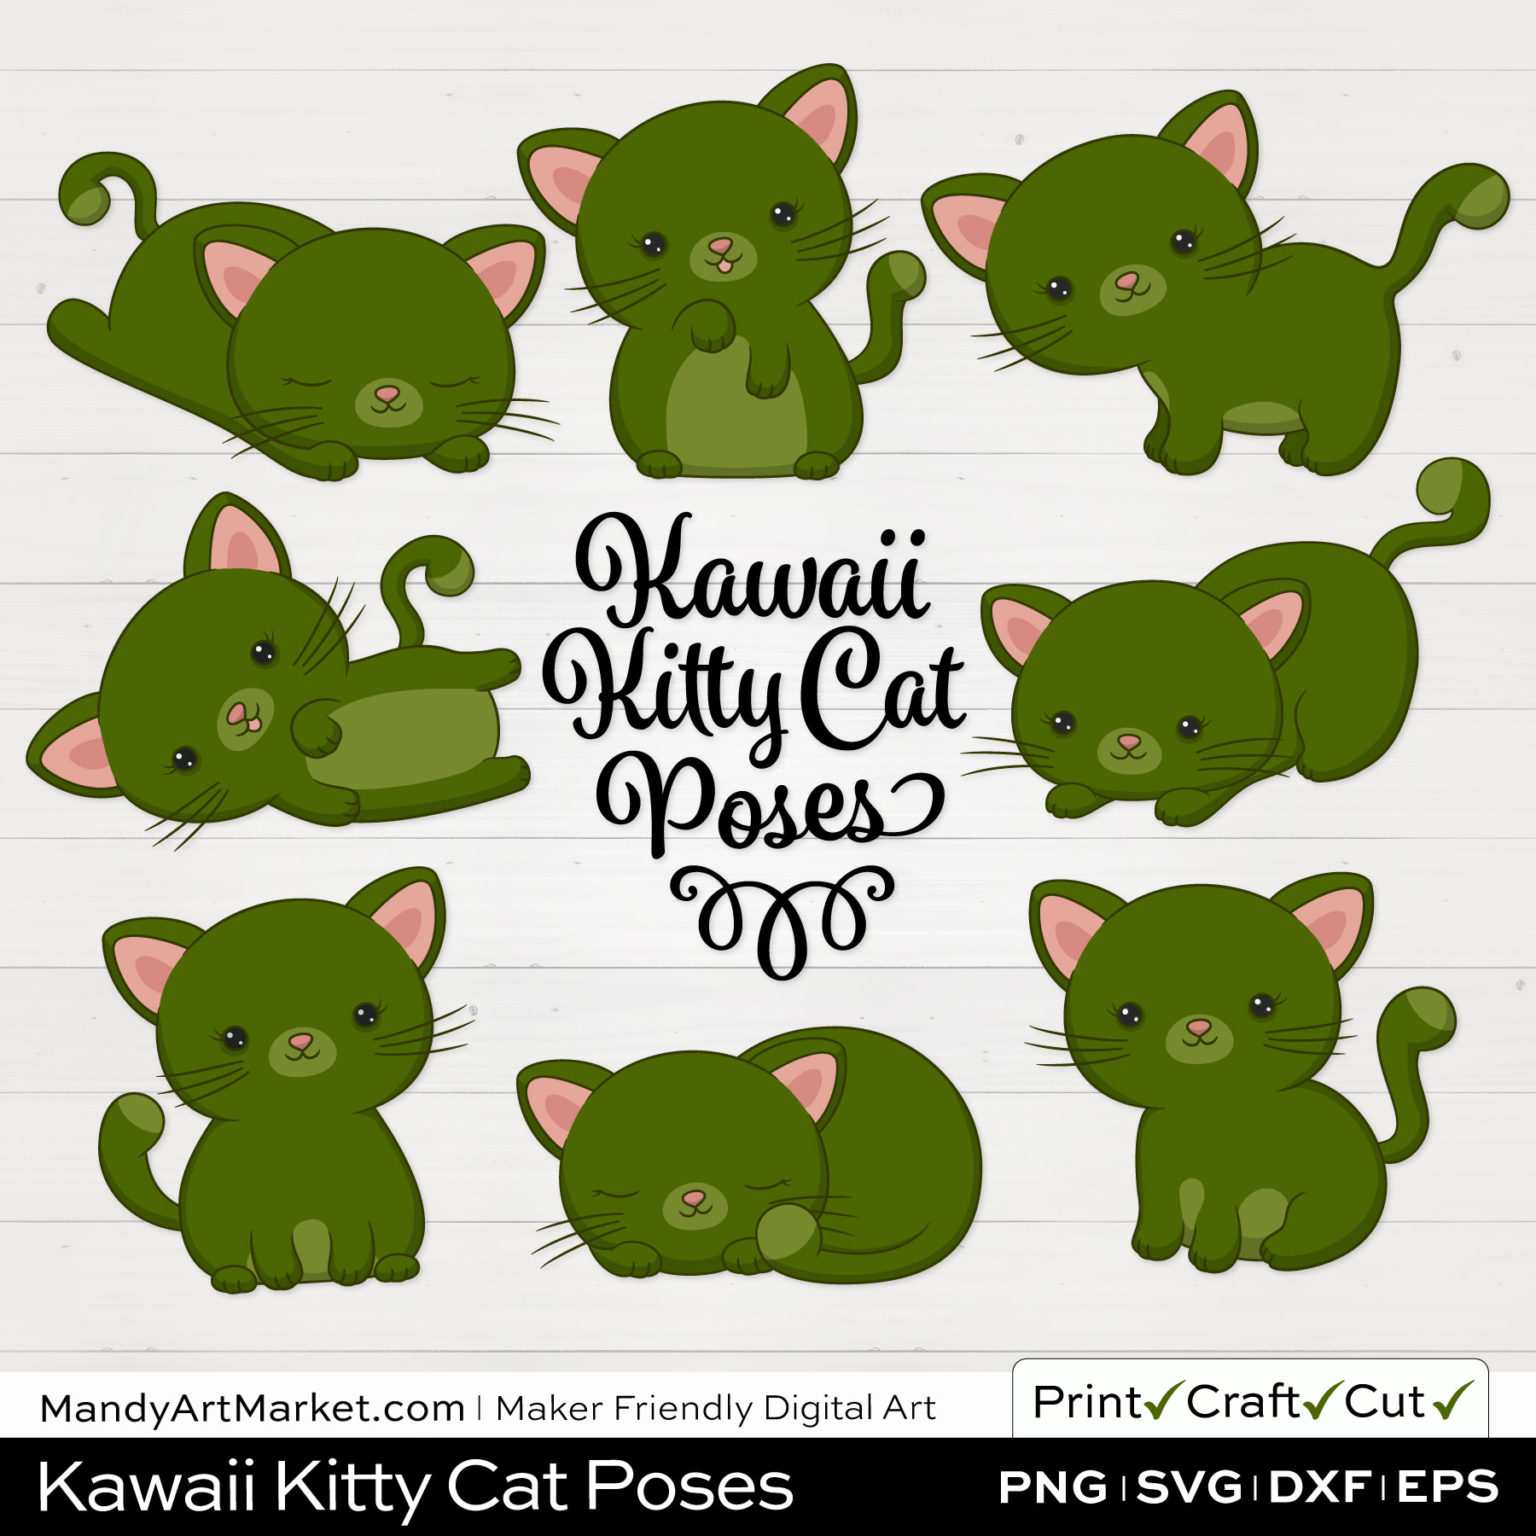 Dark Moss Green Kawaii Kitty Cat Poses Clipart on White Background